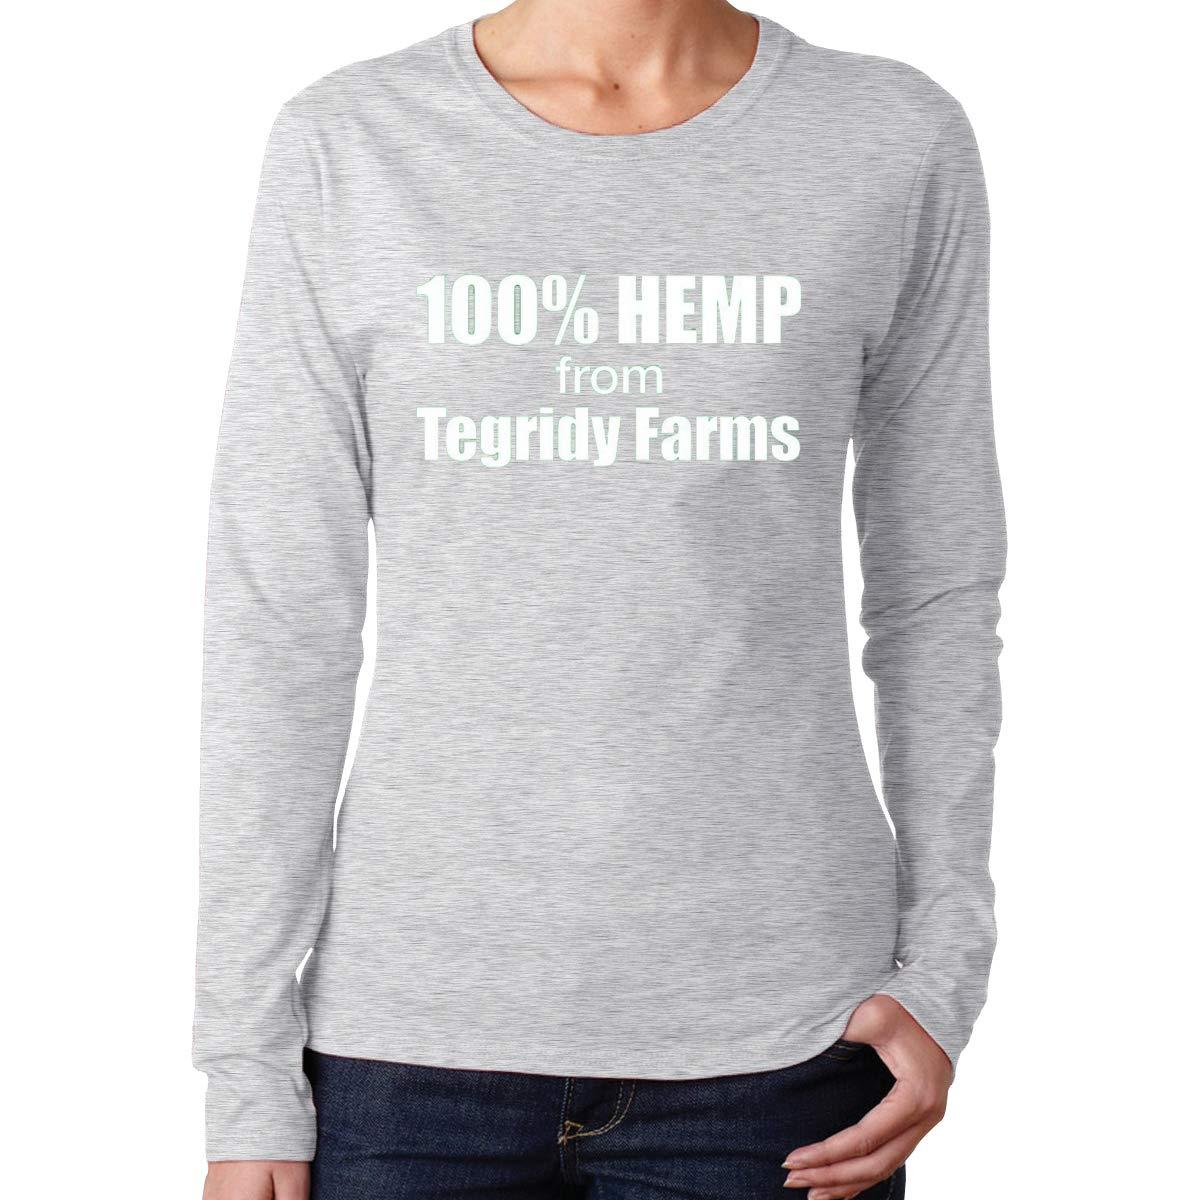 Fingertip Fashion 100 Hemp From Tegridy Farms Long Vintage Sleeve Gray Tshirts